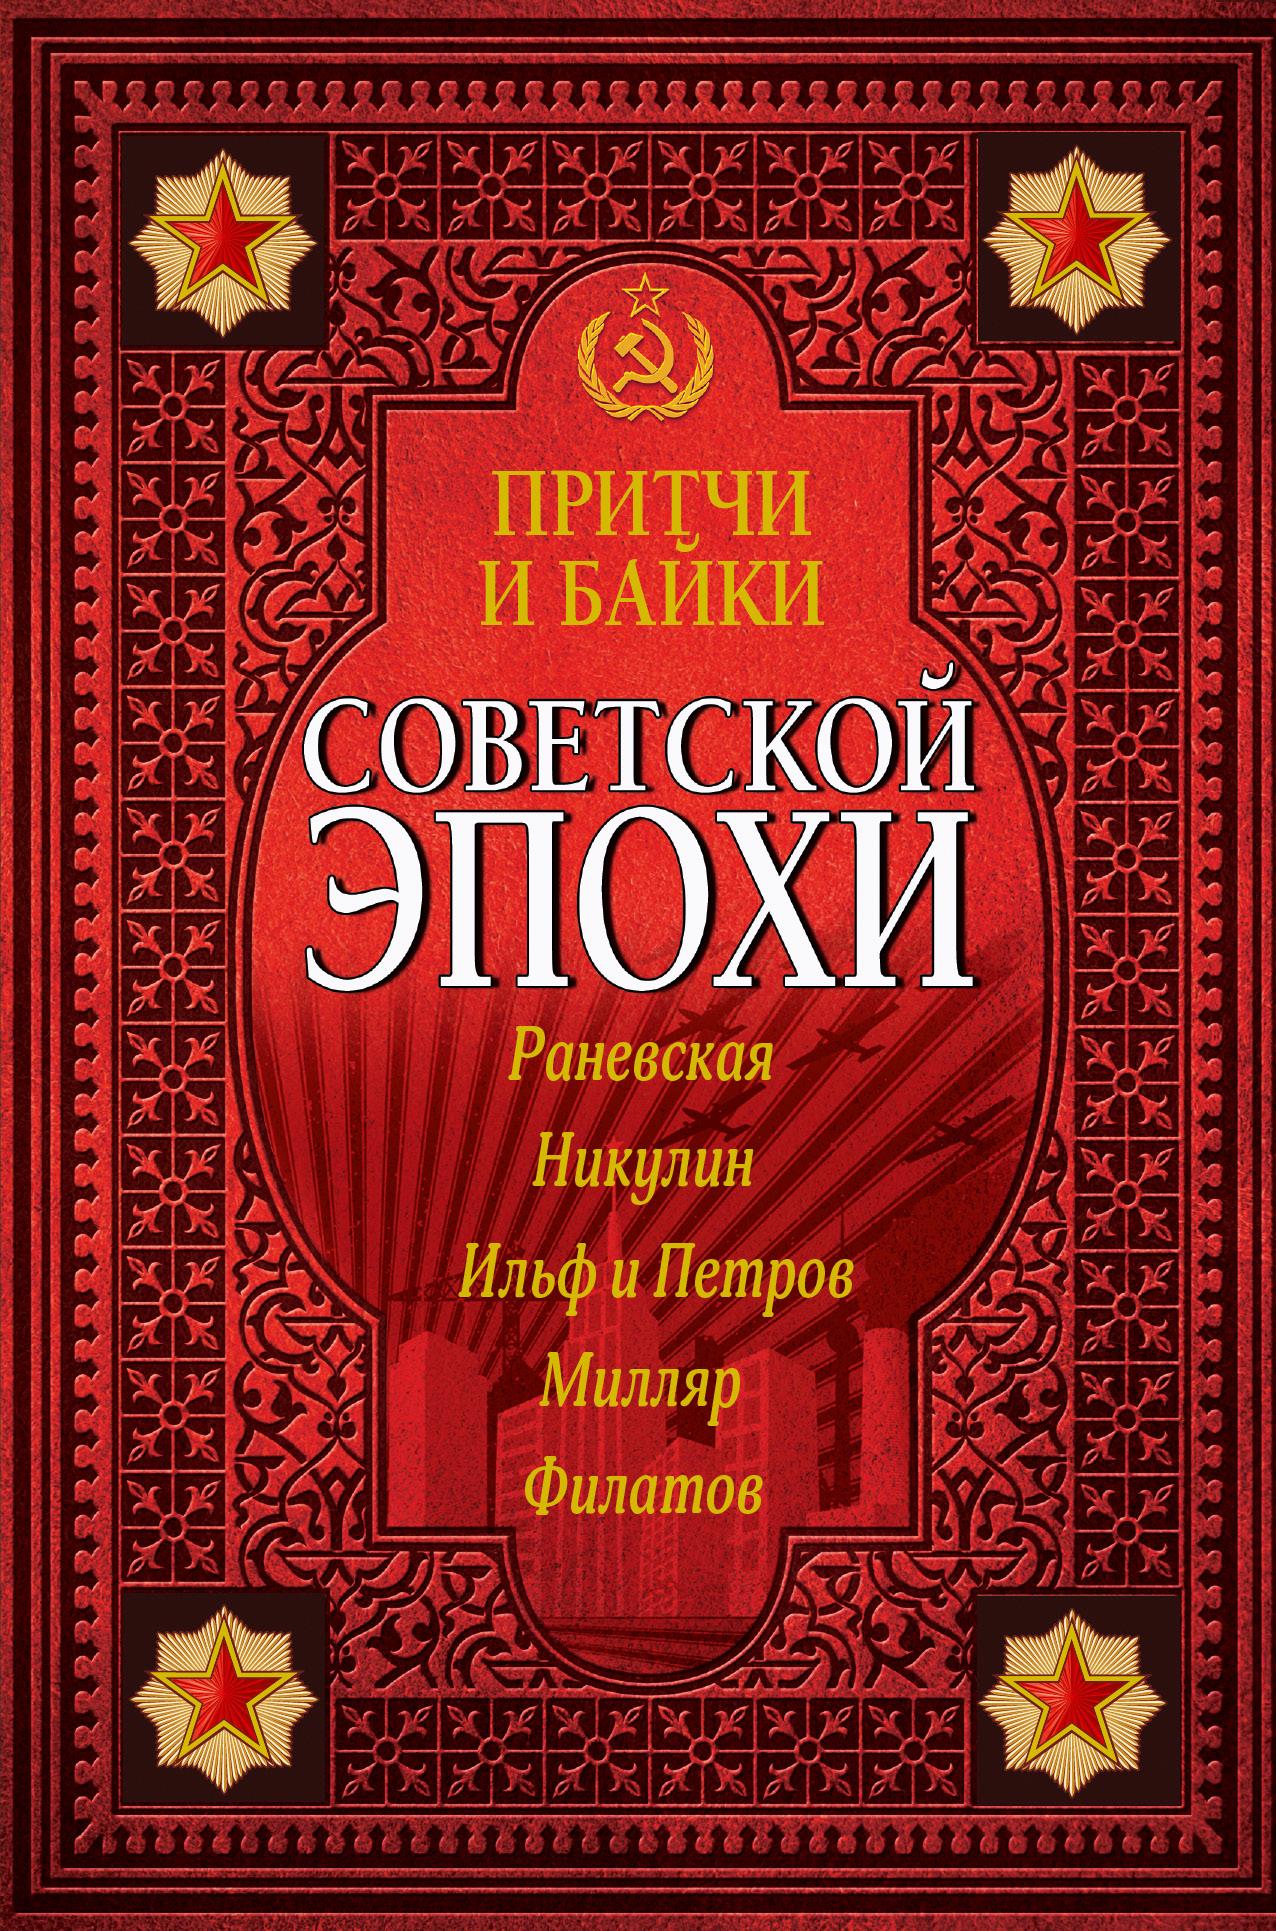 Притчи и байки советской эпохи